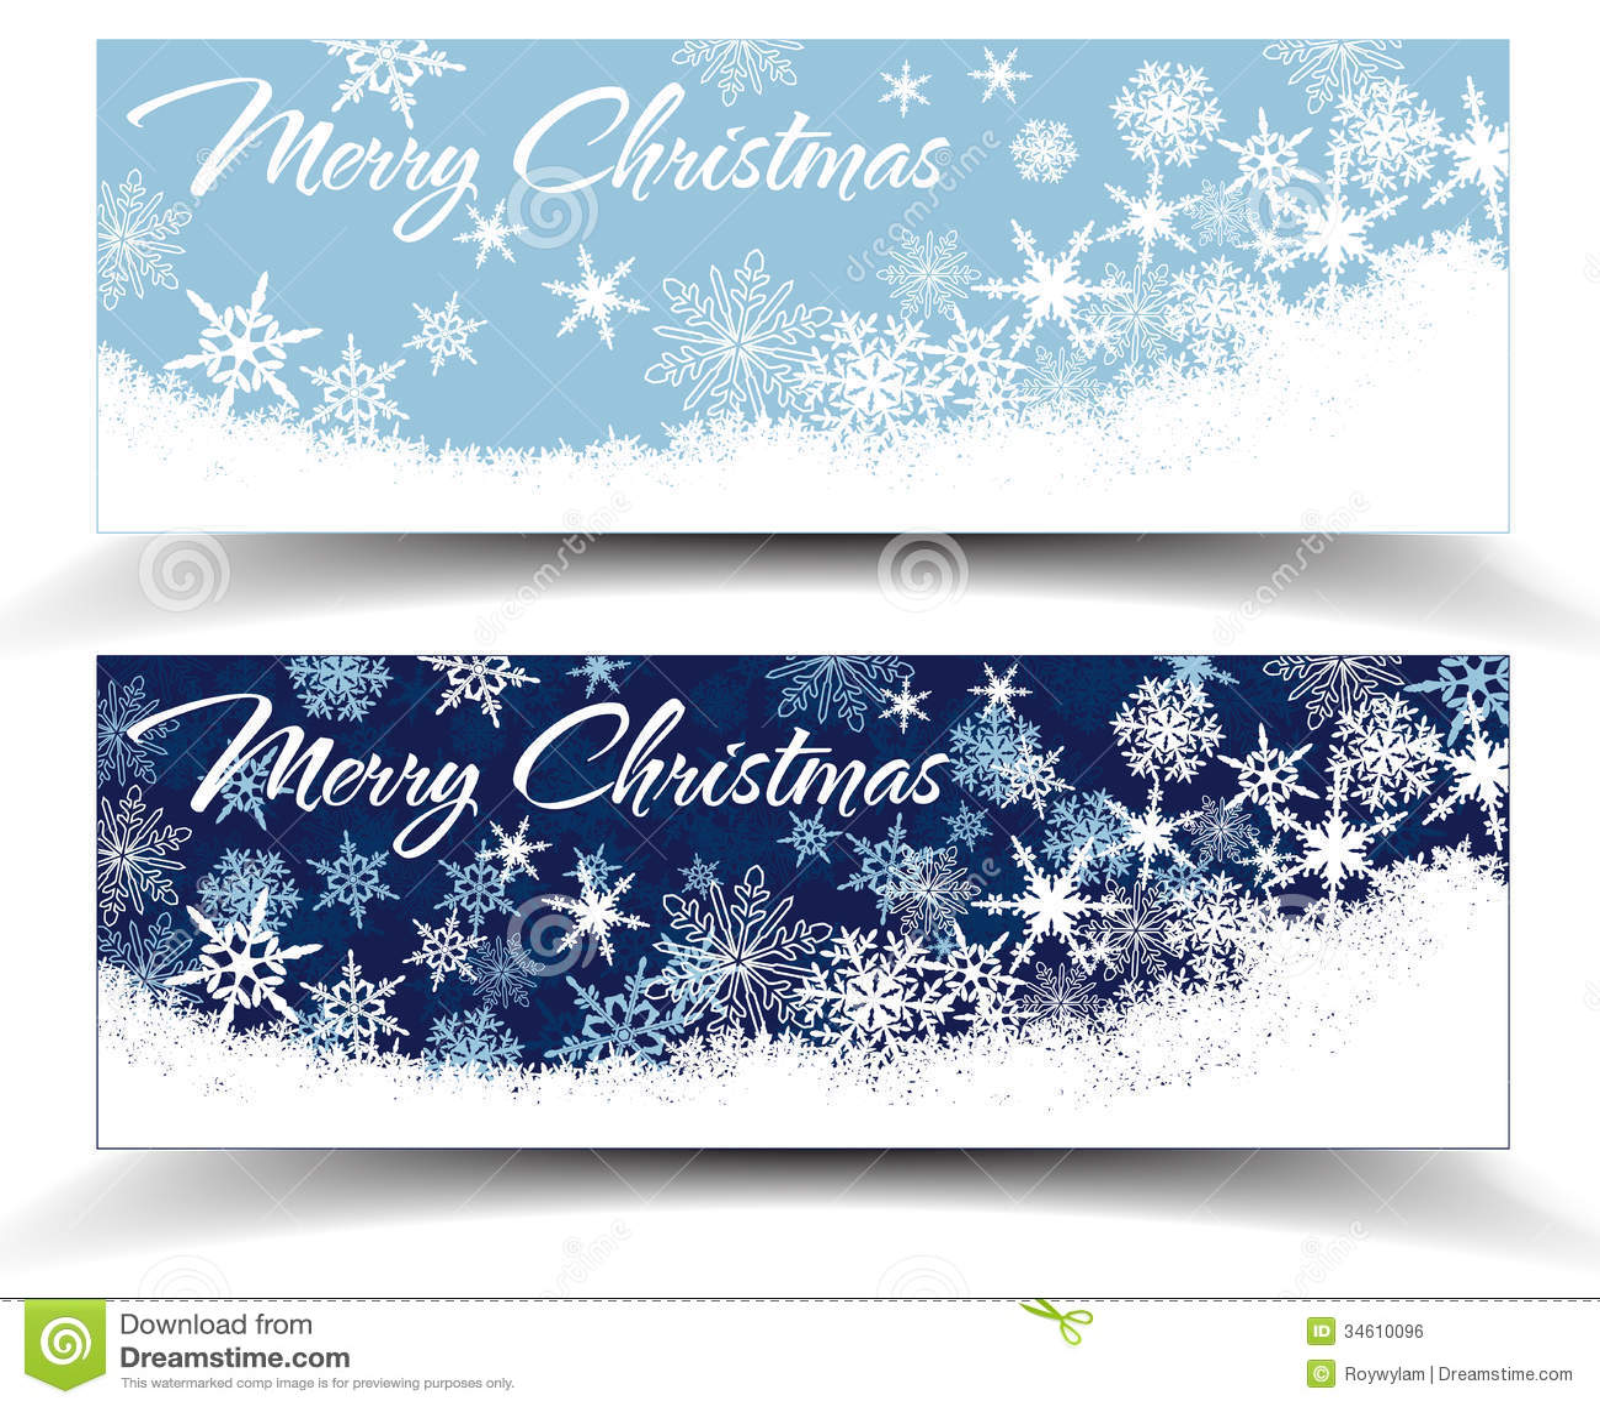 snowflakes christmas web banners royalty free stock image